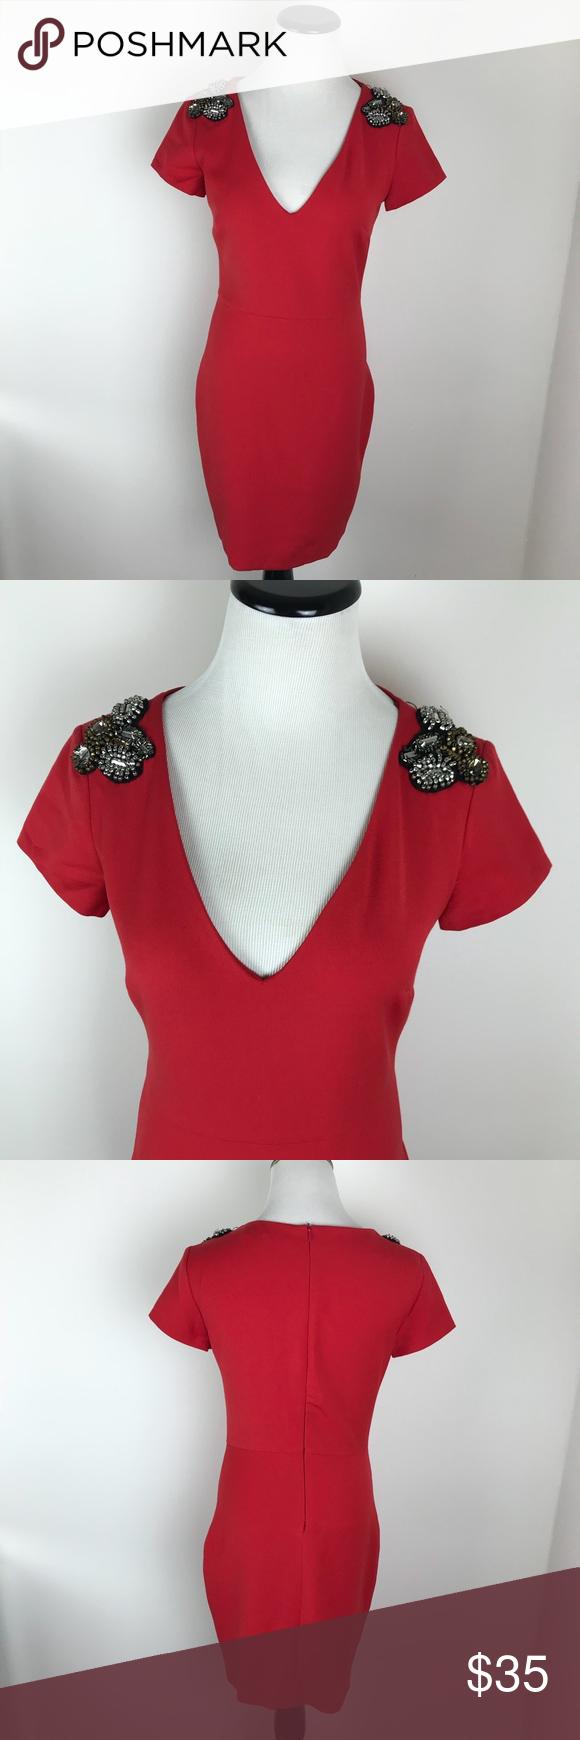 Zara red dress with embellished shoulders my posh picks